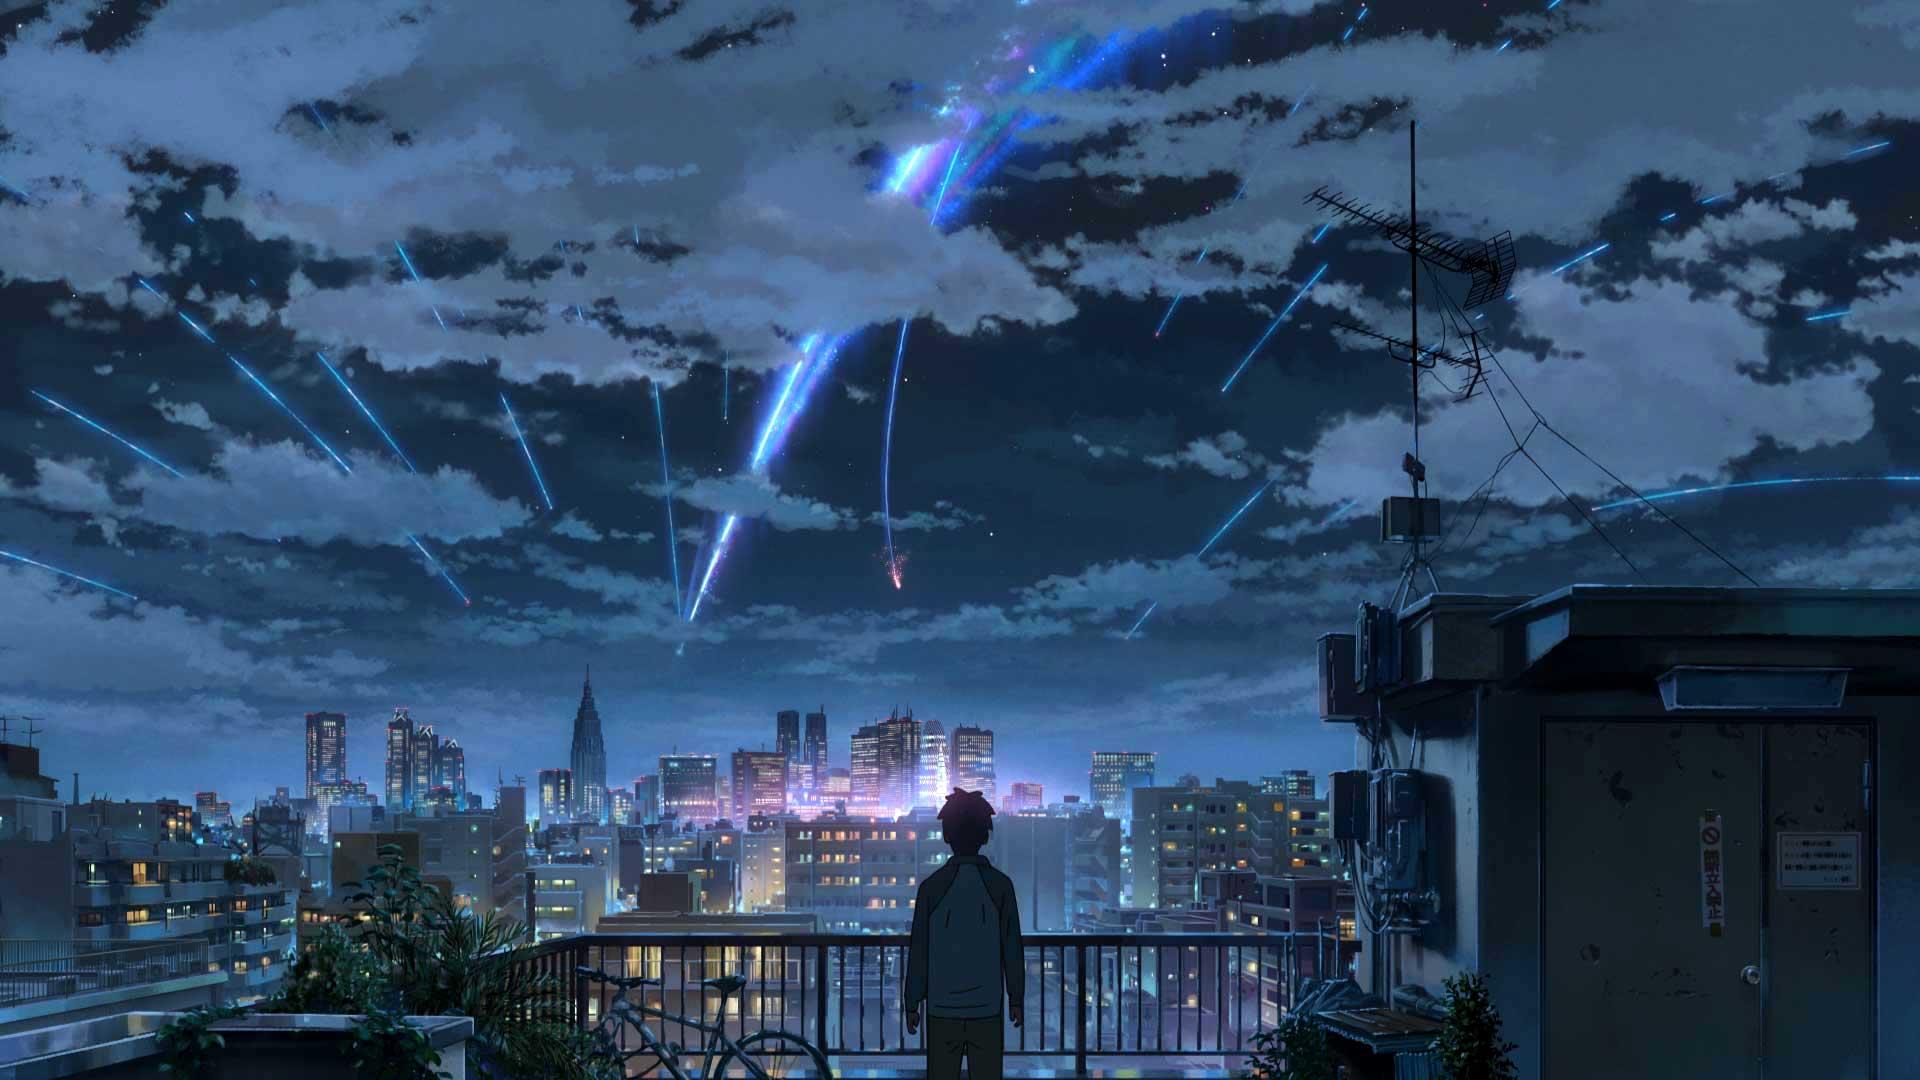 Makoto Shinkai's Your Name